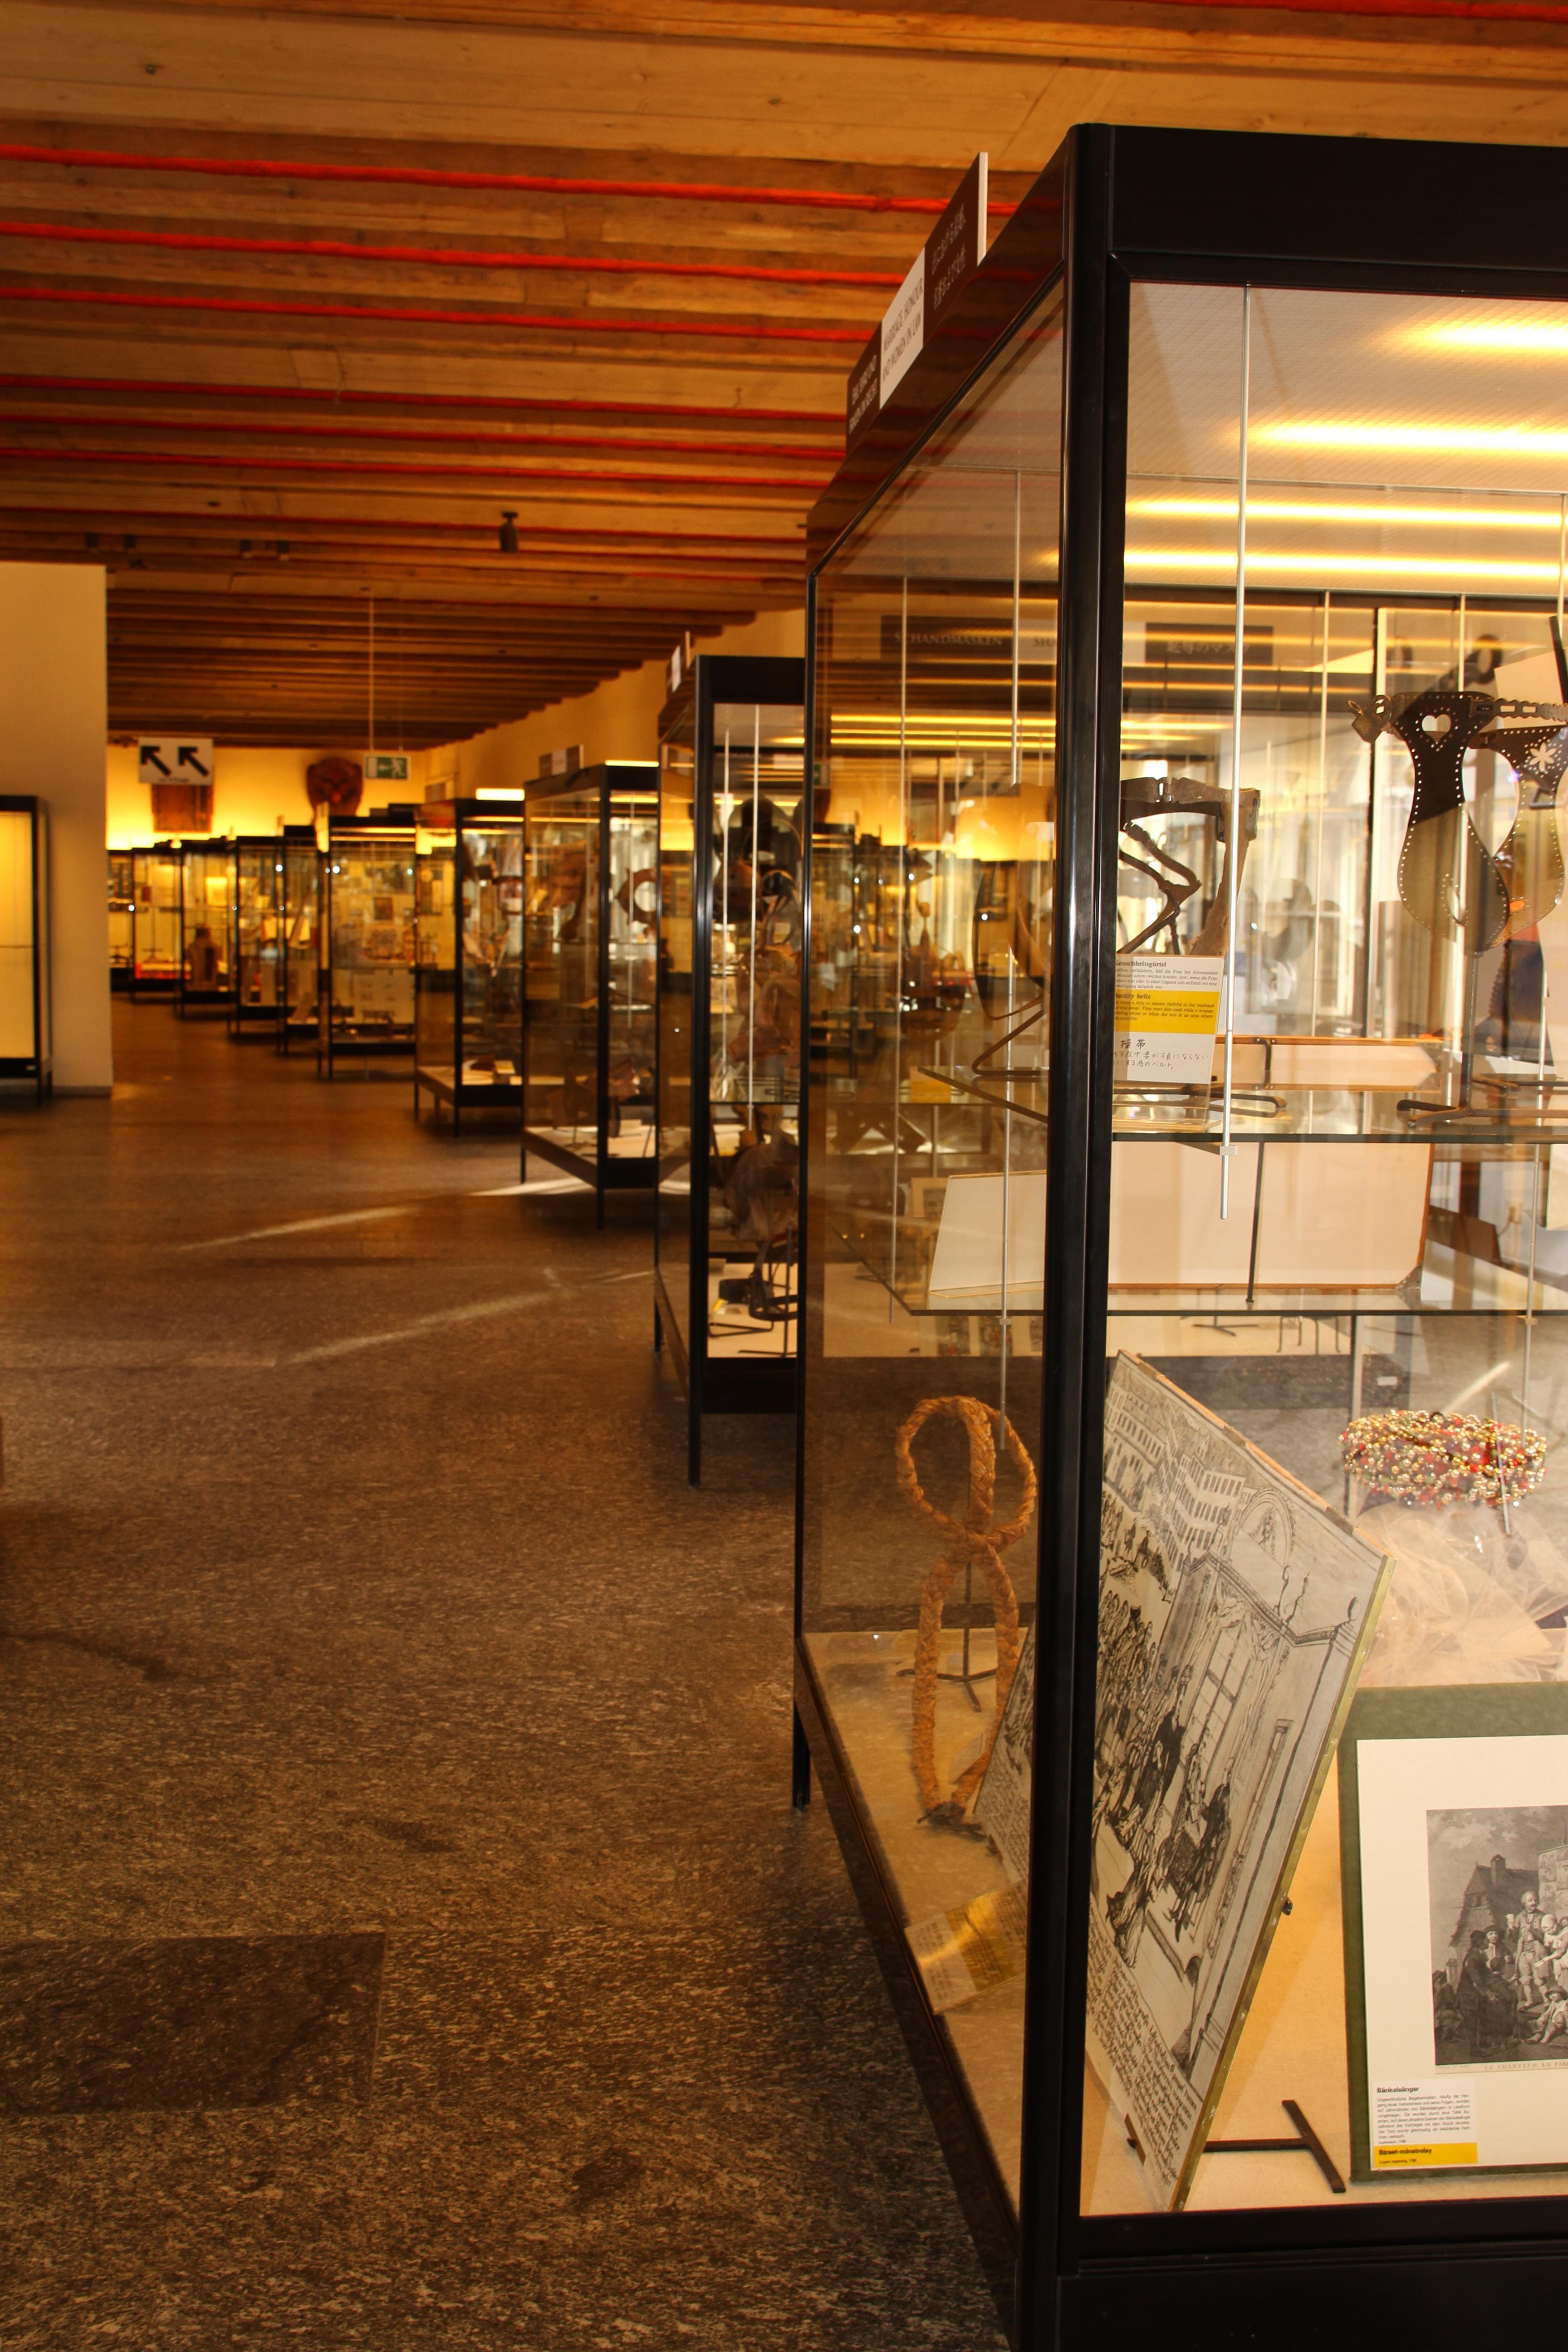 Kriminalmuseum - Roud Tour - Innenansicht